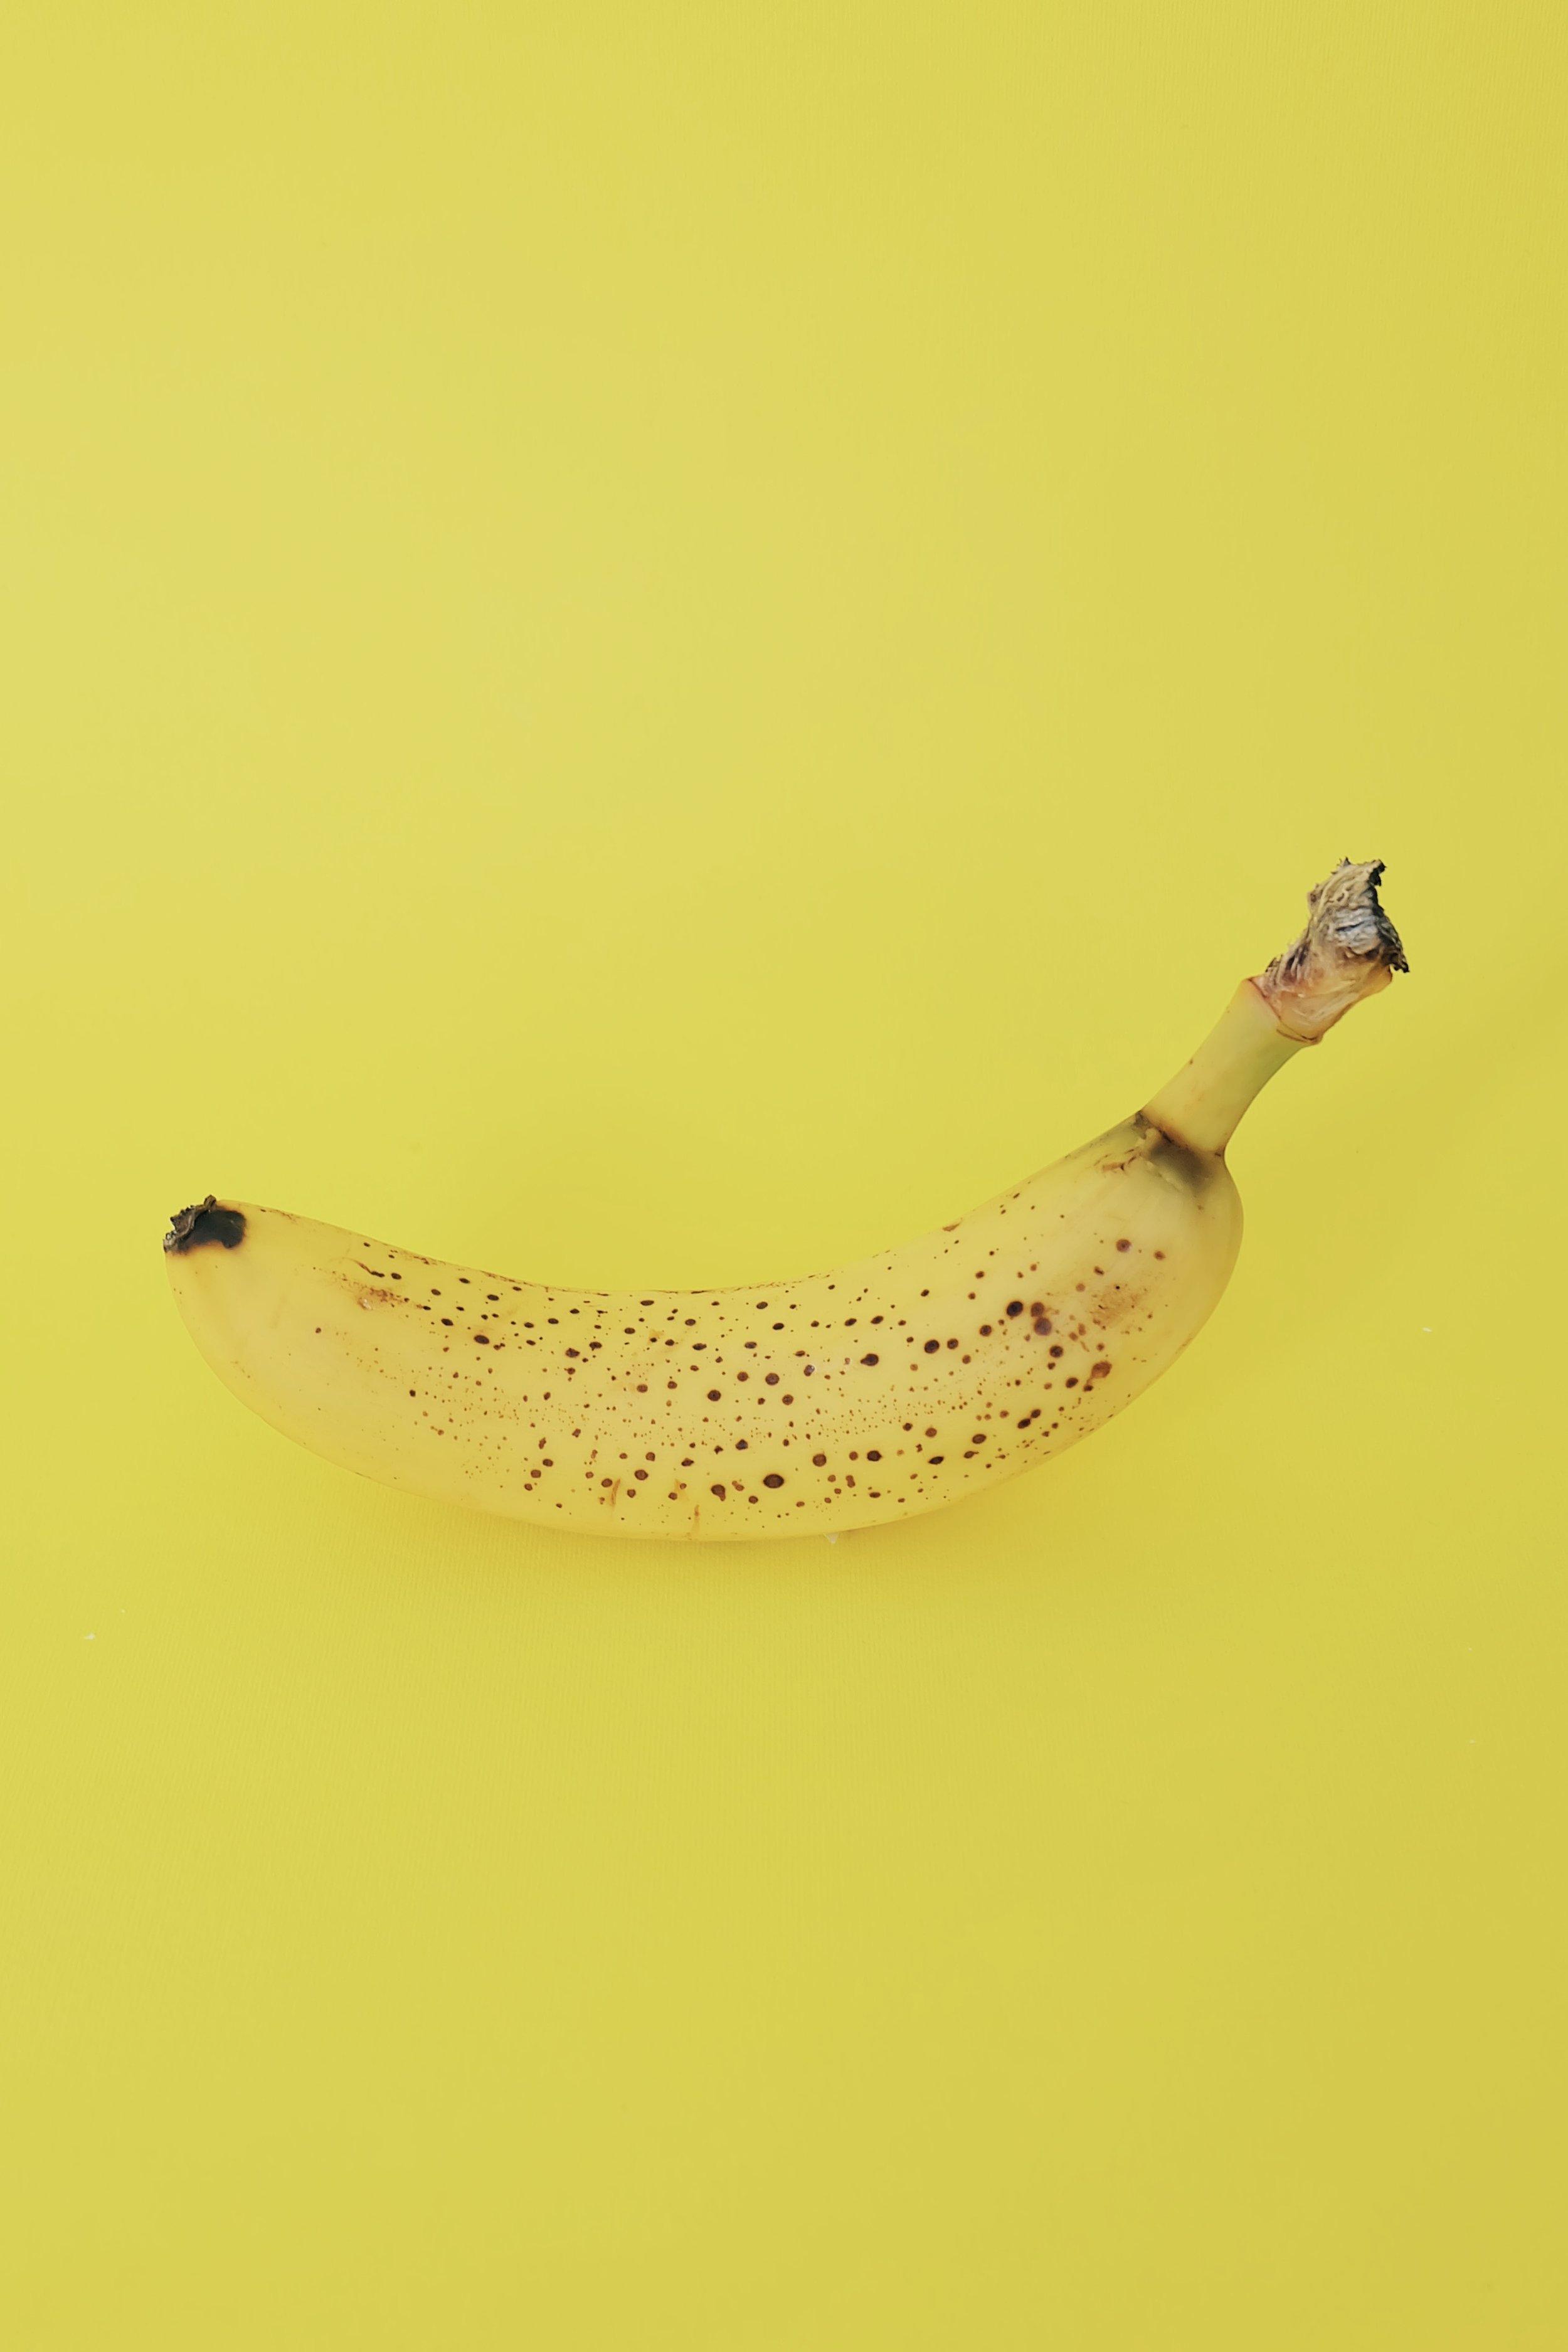 art-on-a-budget-banana.JPG